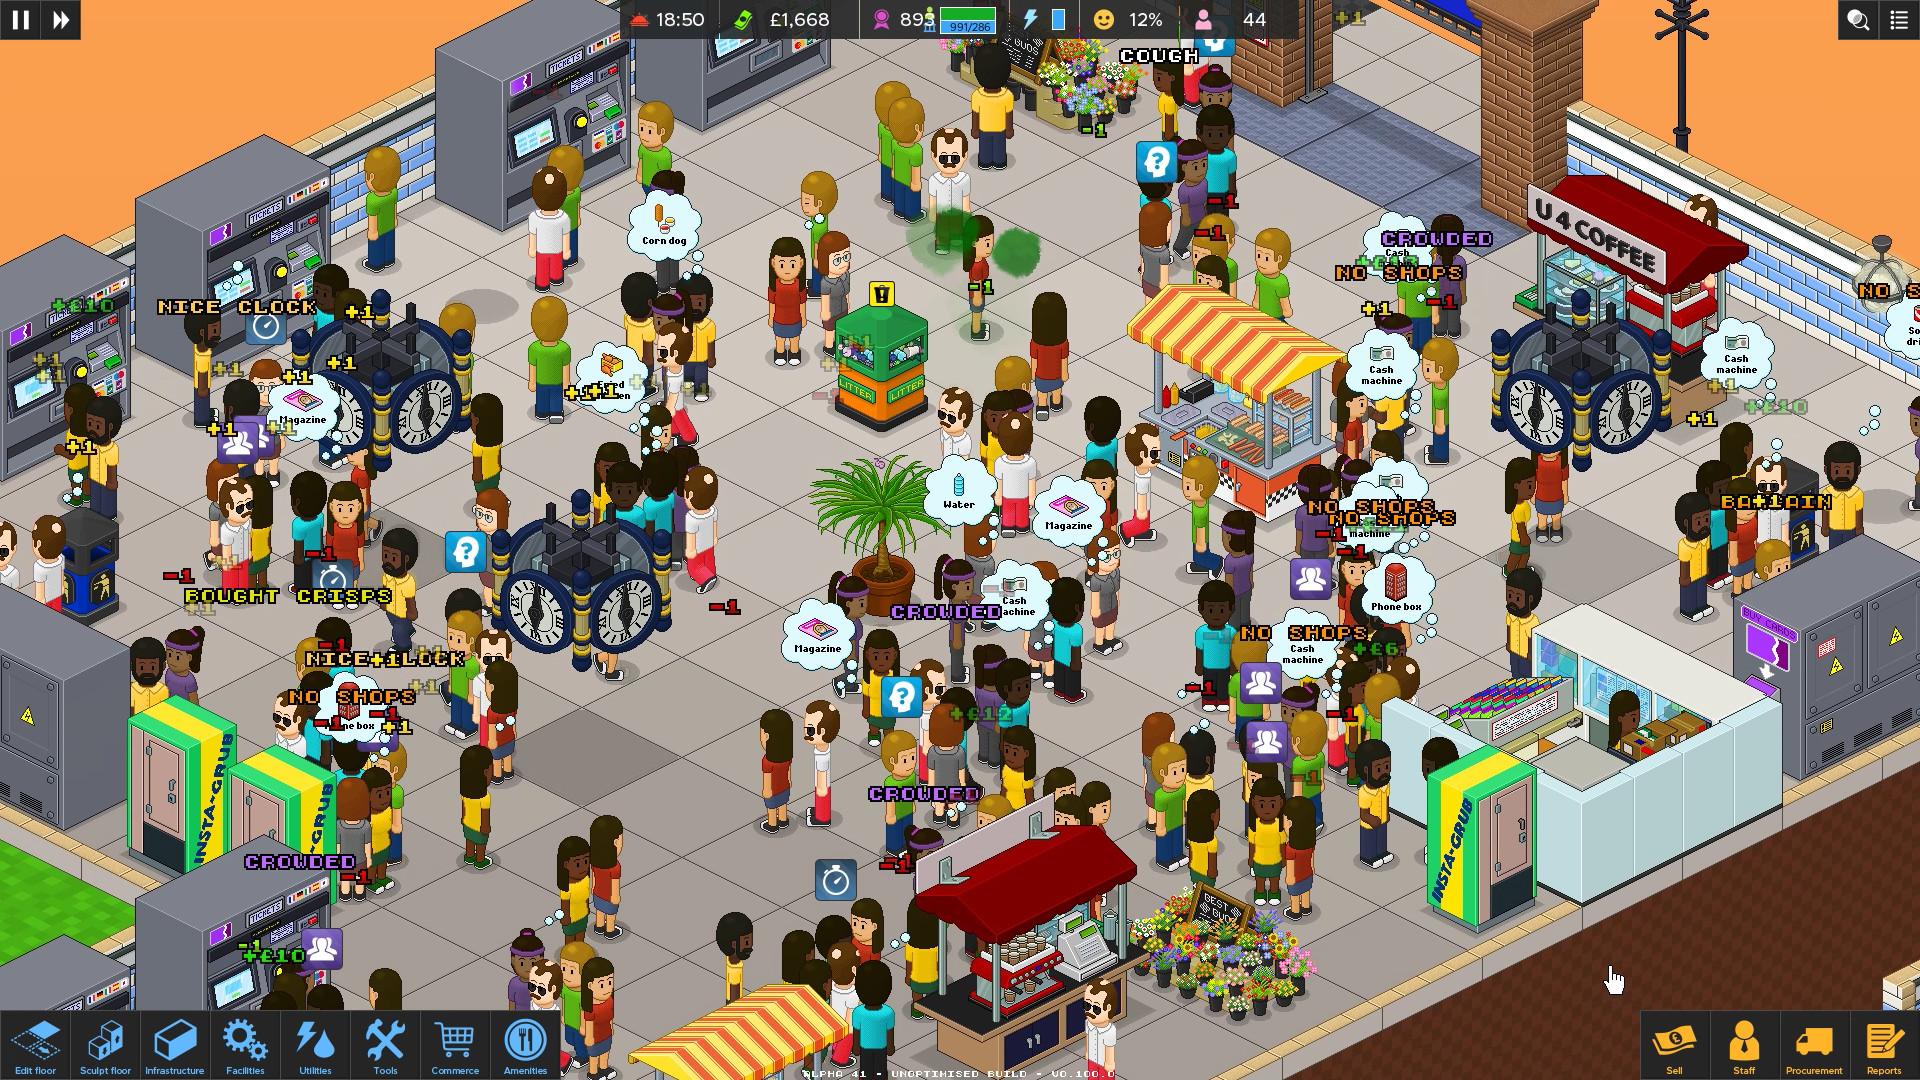 通勤:地铁站/Overcrowd: A Commute Em Up插图2